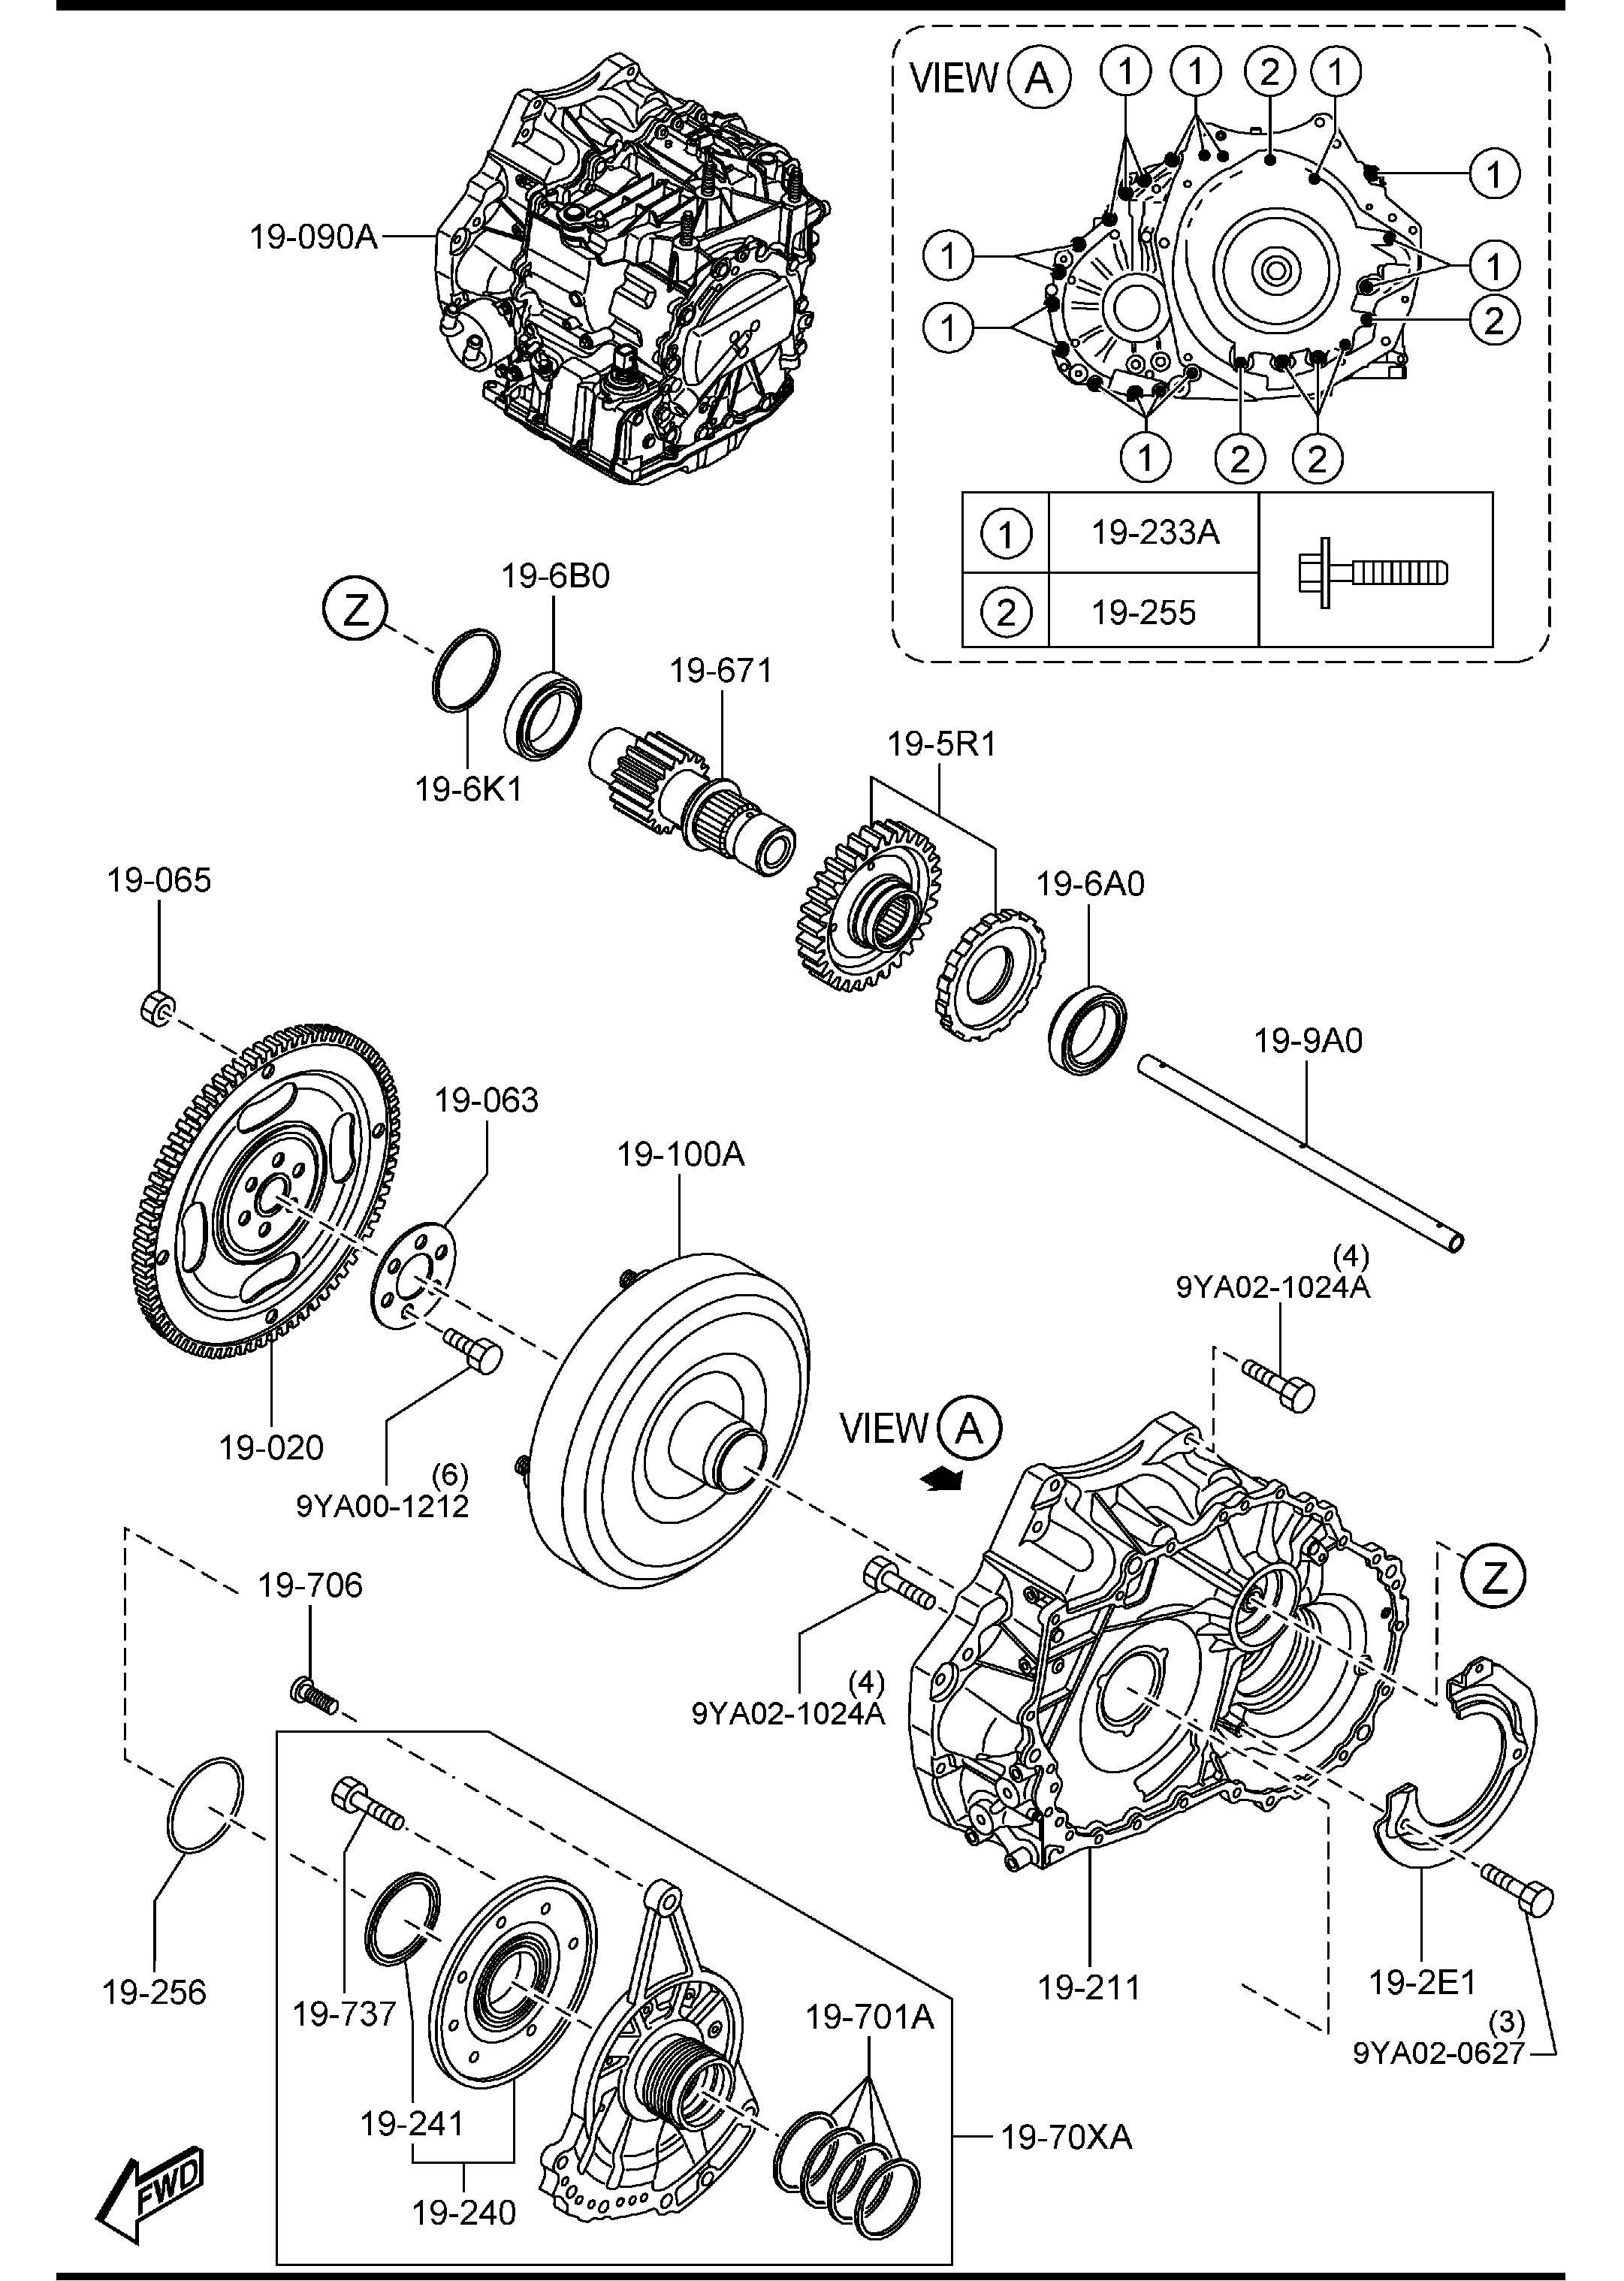 Mazda Automatic Transmission Torque Converter Oil